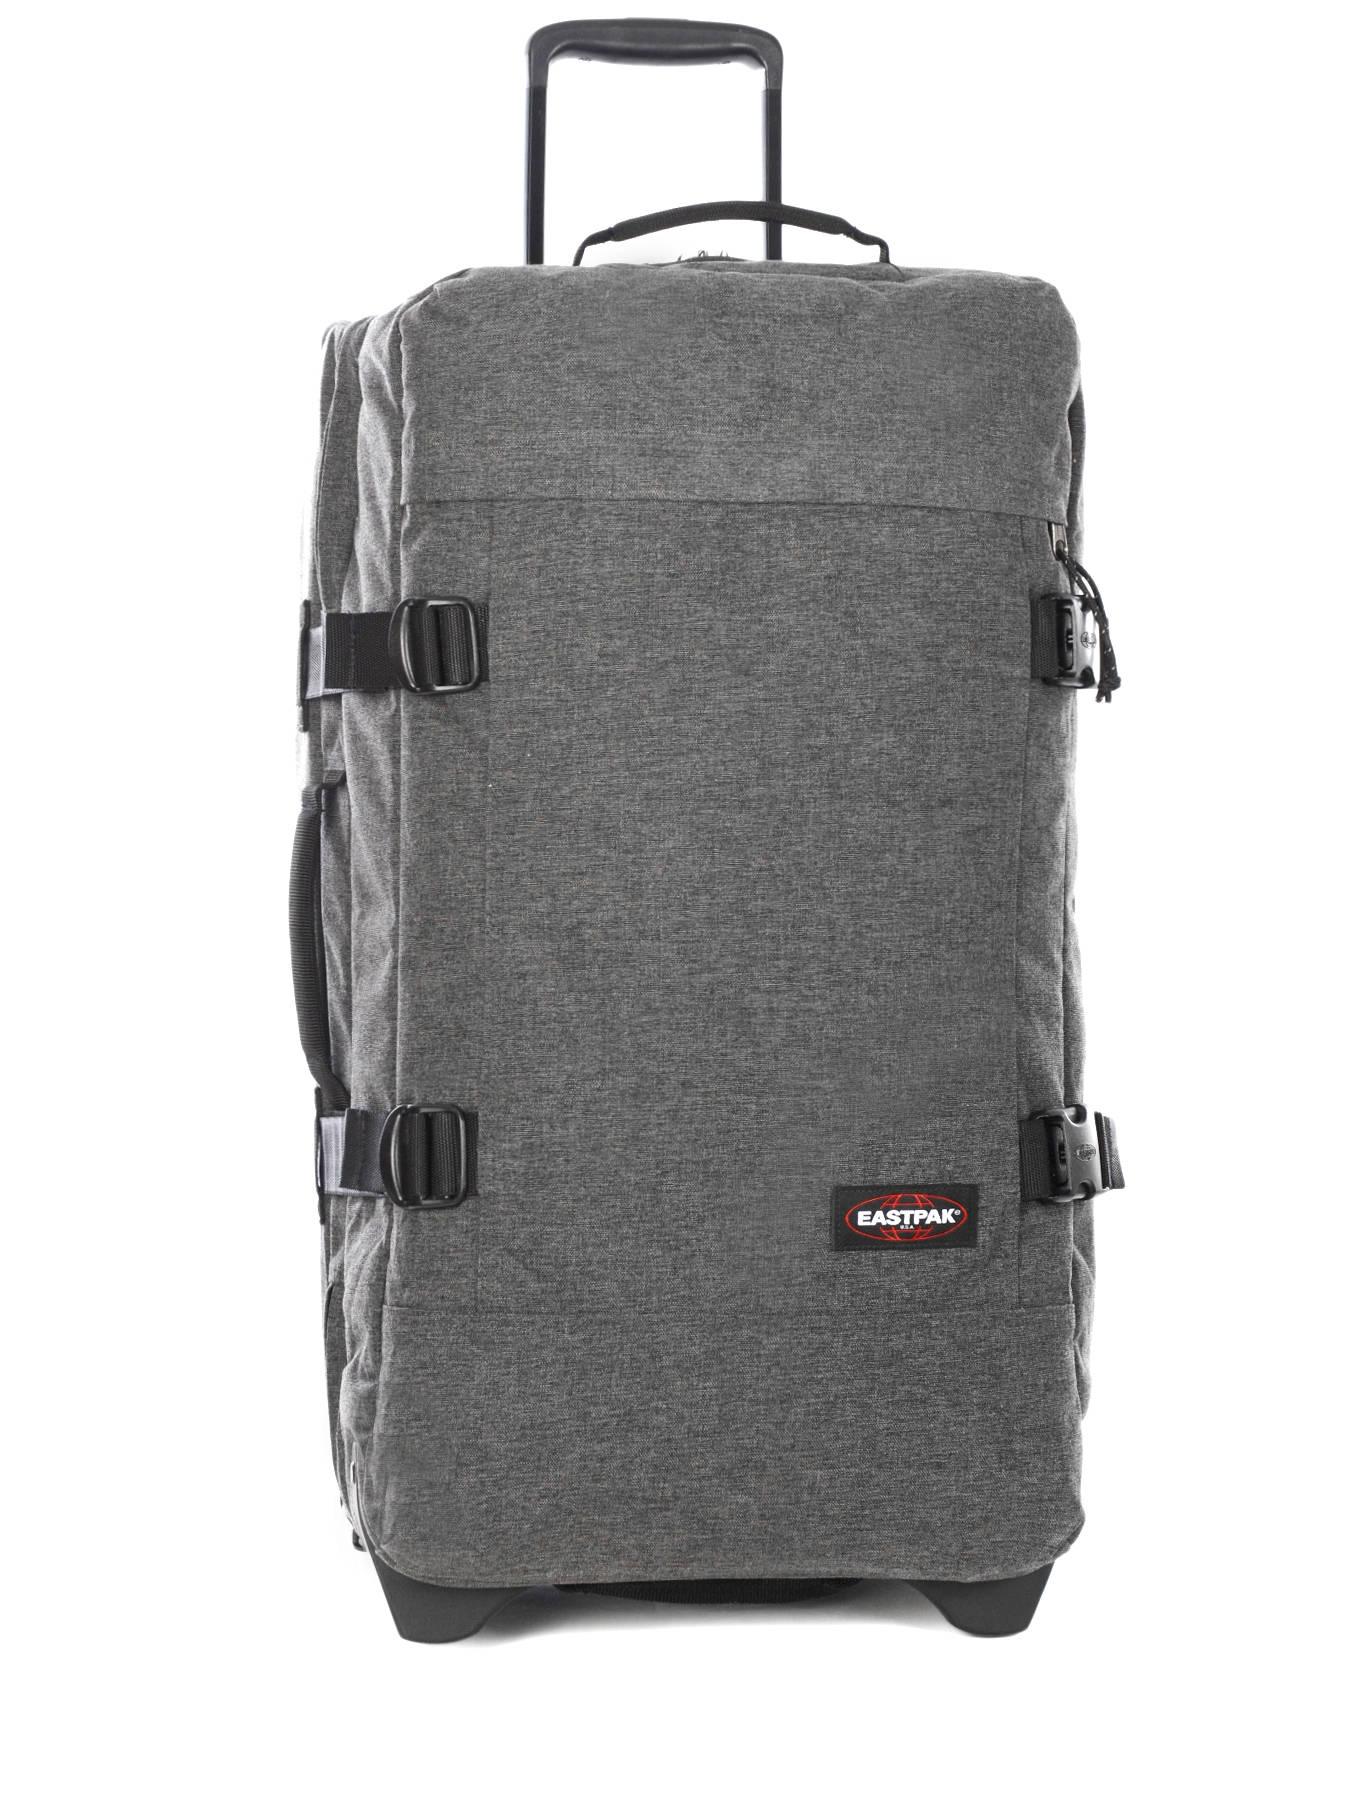 e2637c4c433 ... Soepele Reiskoffer Authentic Luggage Eastpak Grijs authentic luggage  K62L ...